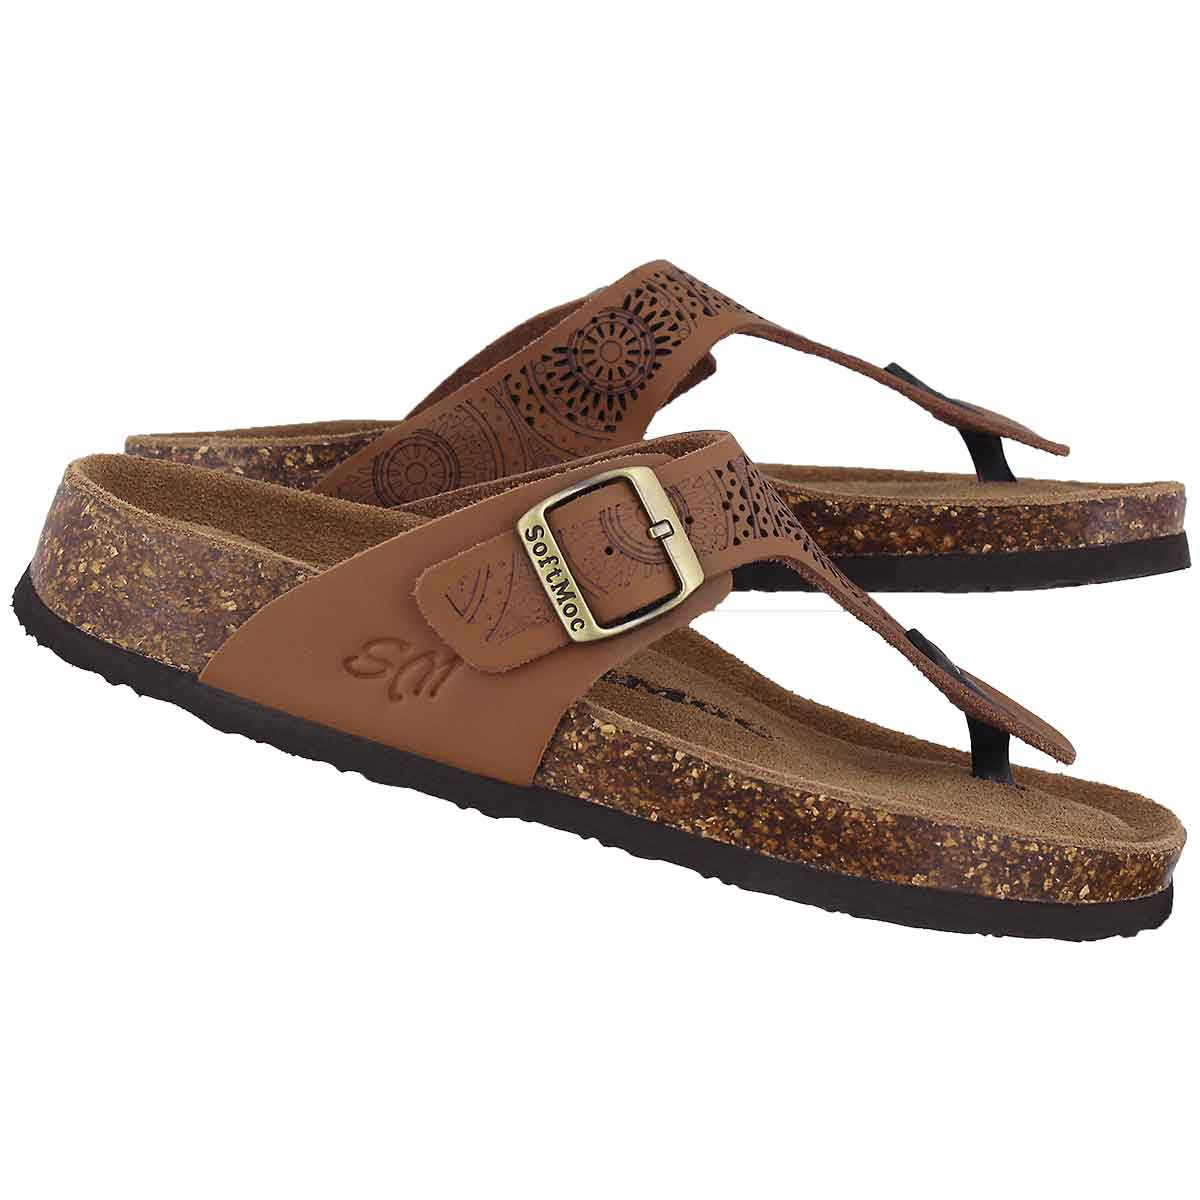 Lds Angy 5 cgn perf mem foam thng sandal